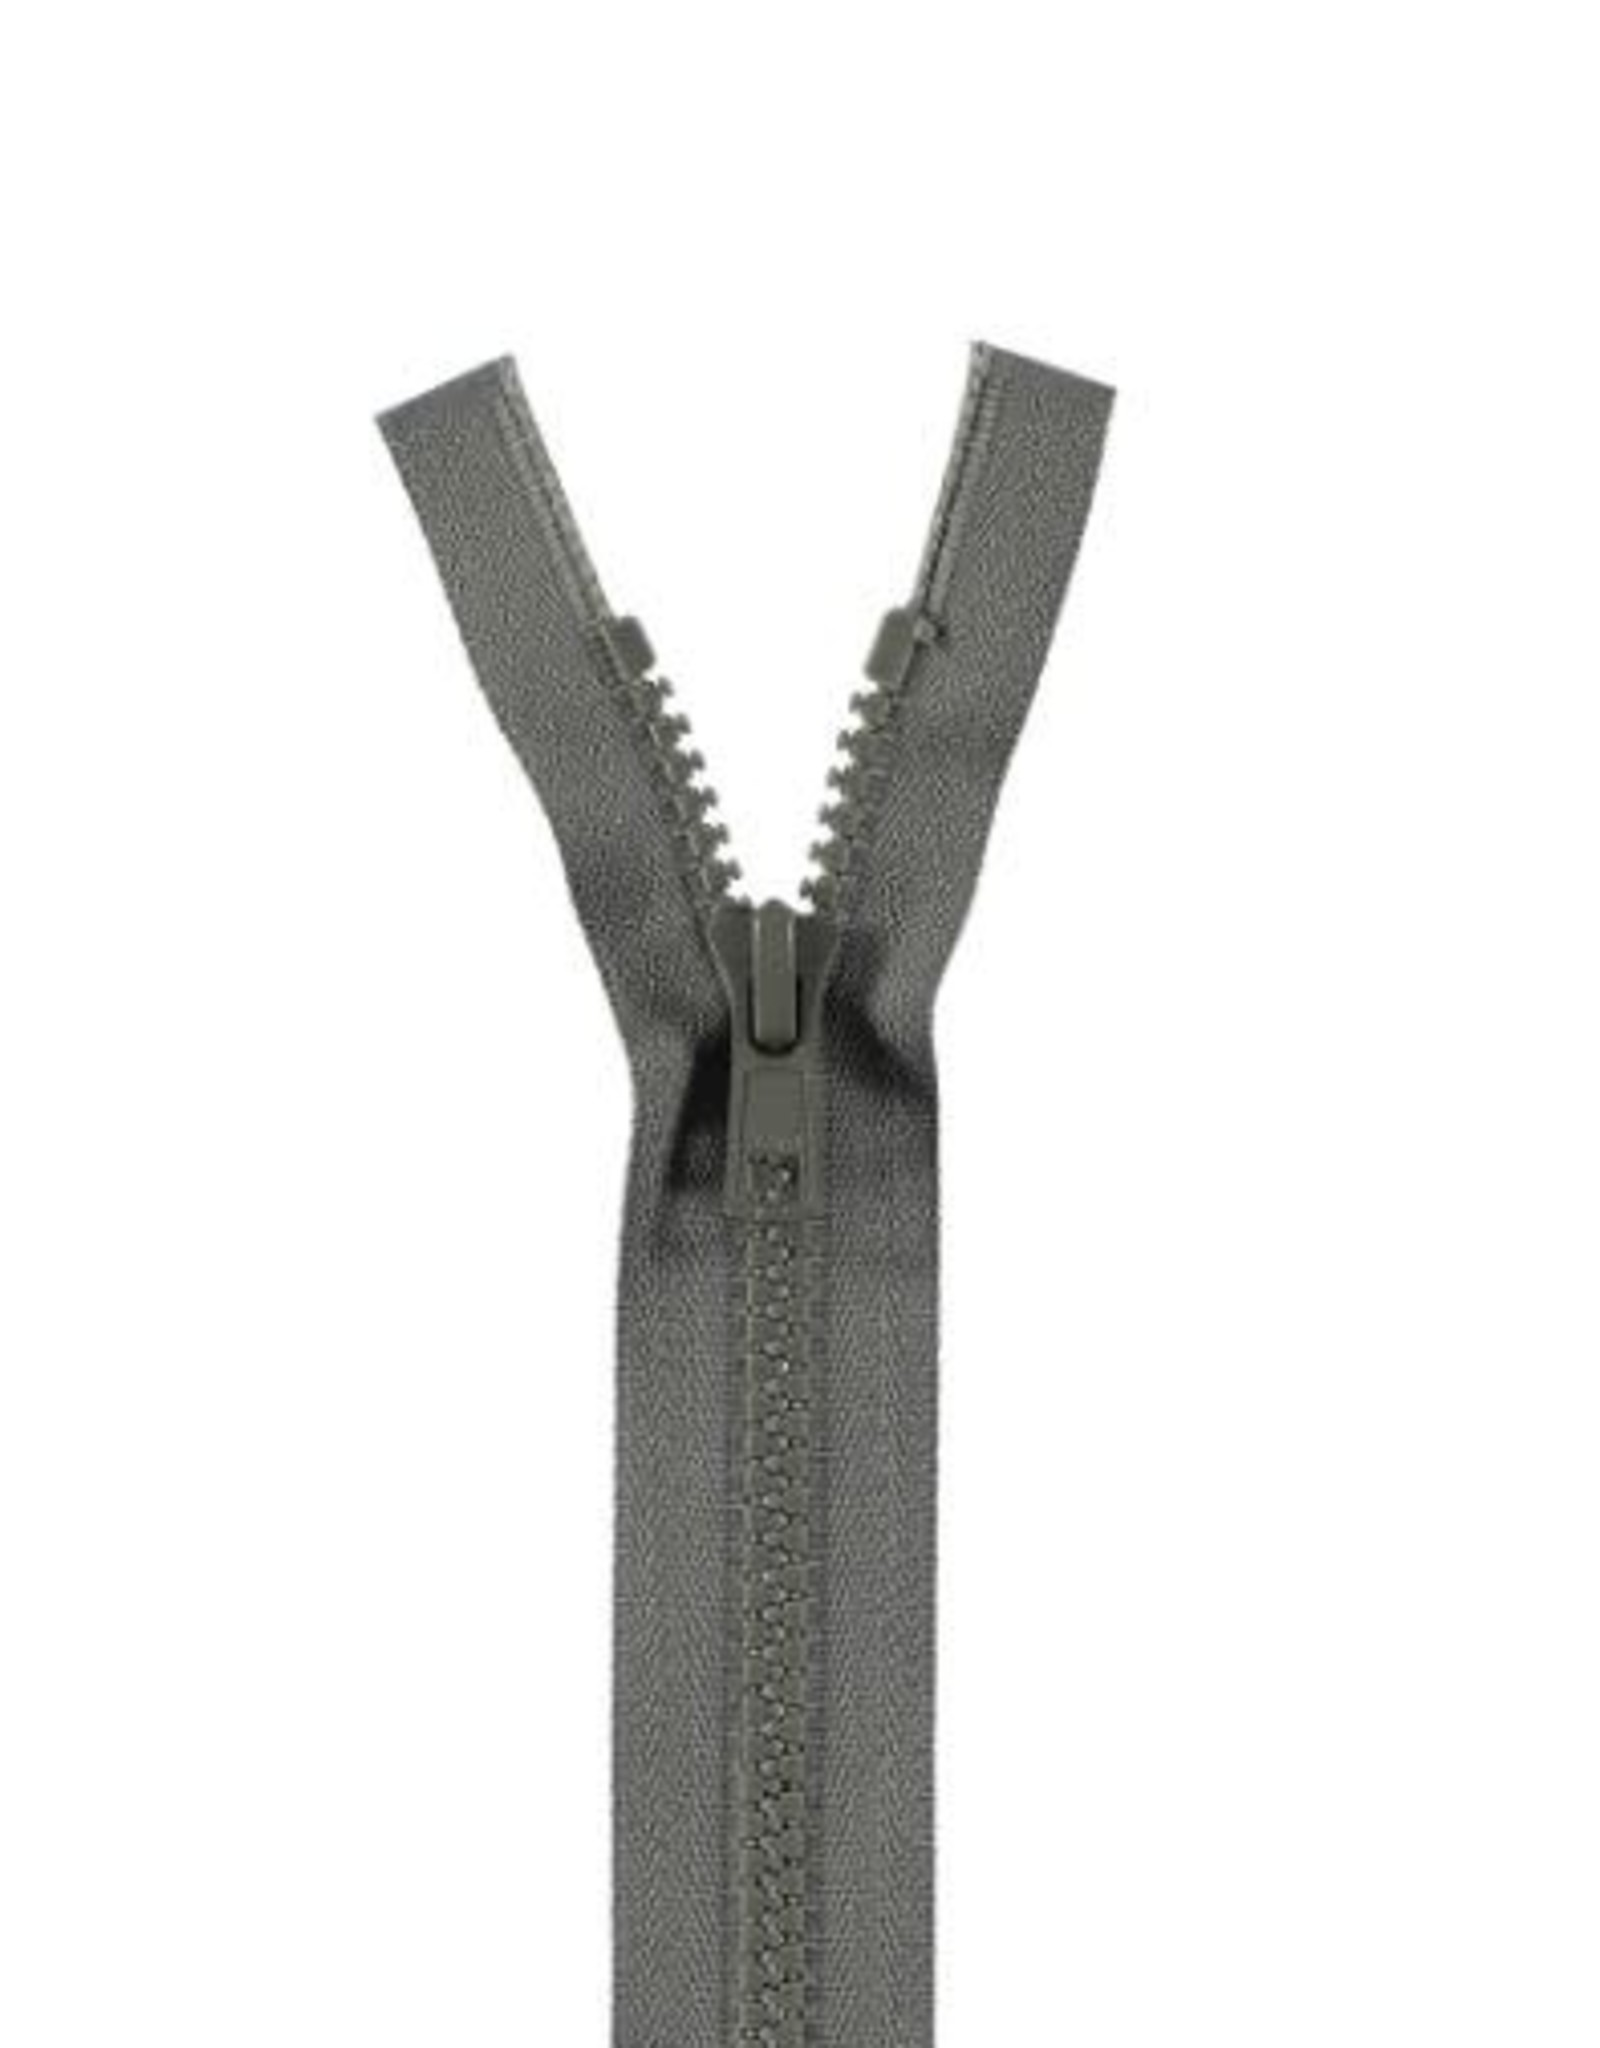 YKK BLOKRITS 5 DEELBAAR grijs 578-30cm